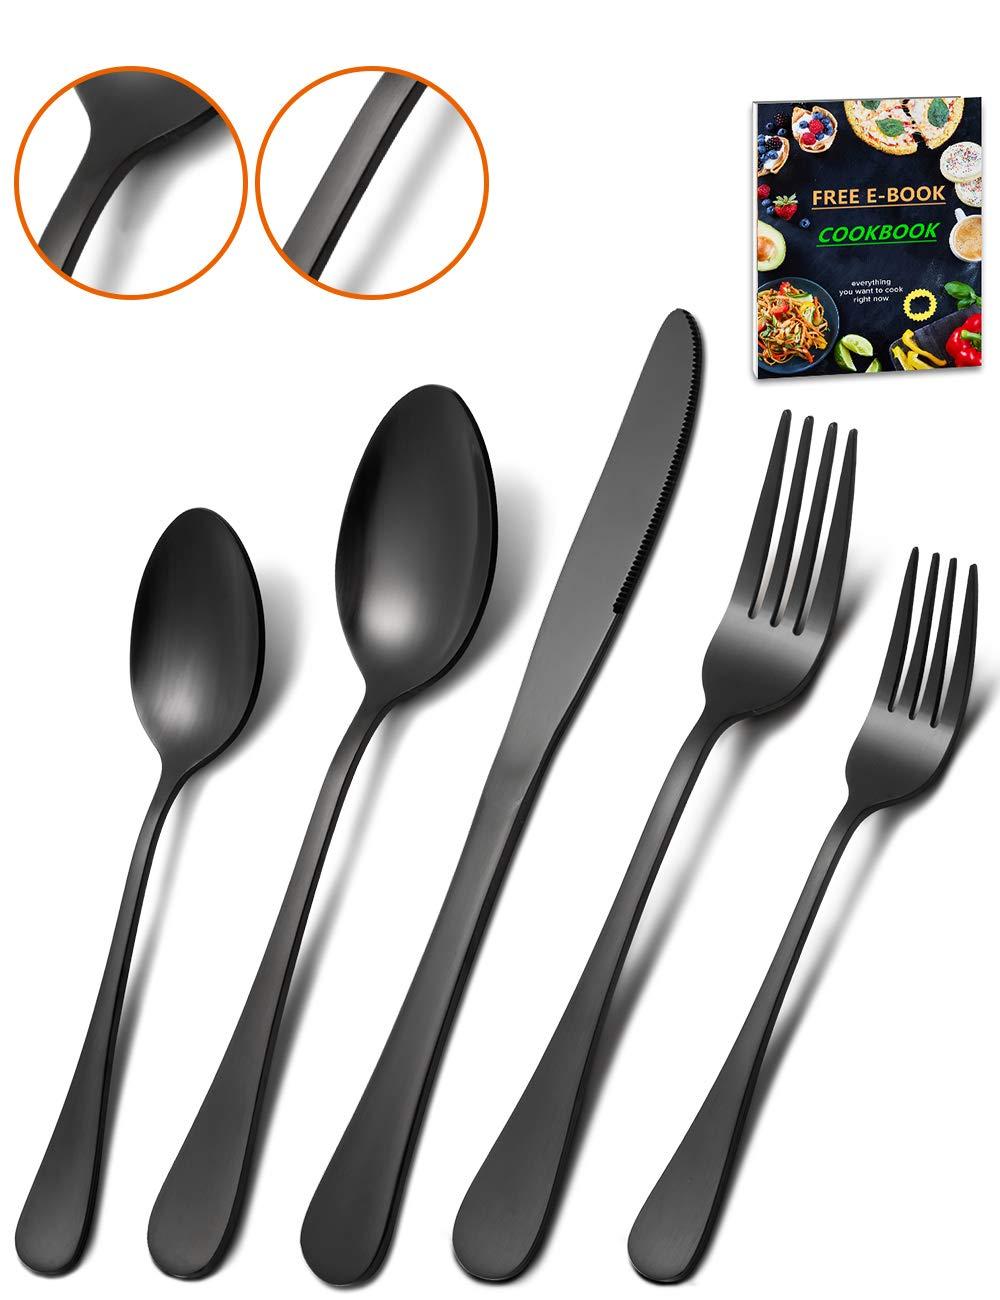 Matte Black Silverware Set - HEAVY DUTY 45 Pieces Stainless Steel Flatware Utensils Cutlery Tableware Steak Knife Fork and Spoon Service for 8 by Acnusik